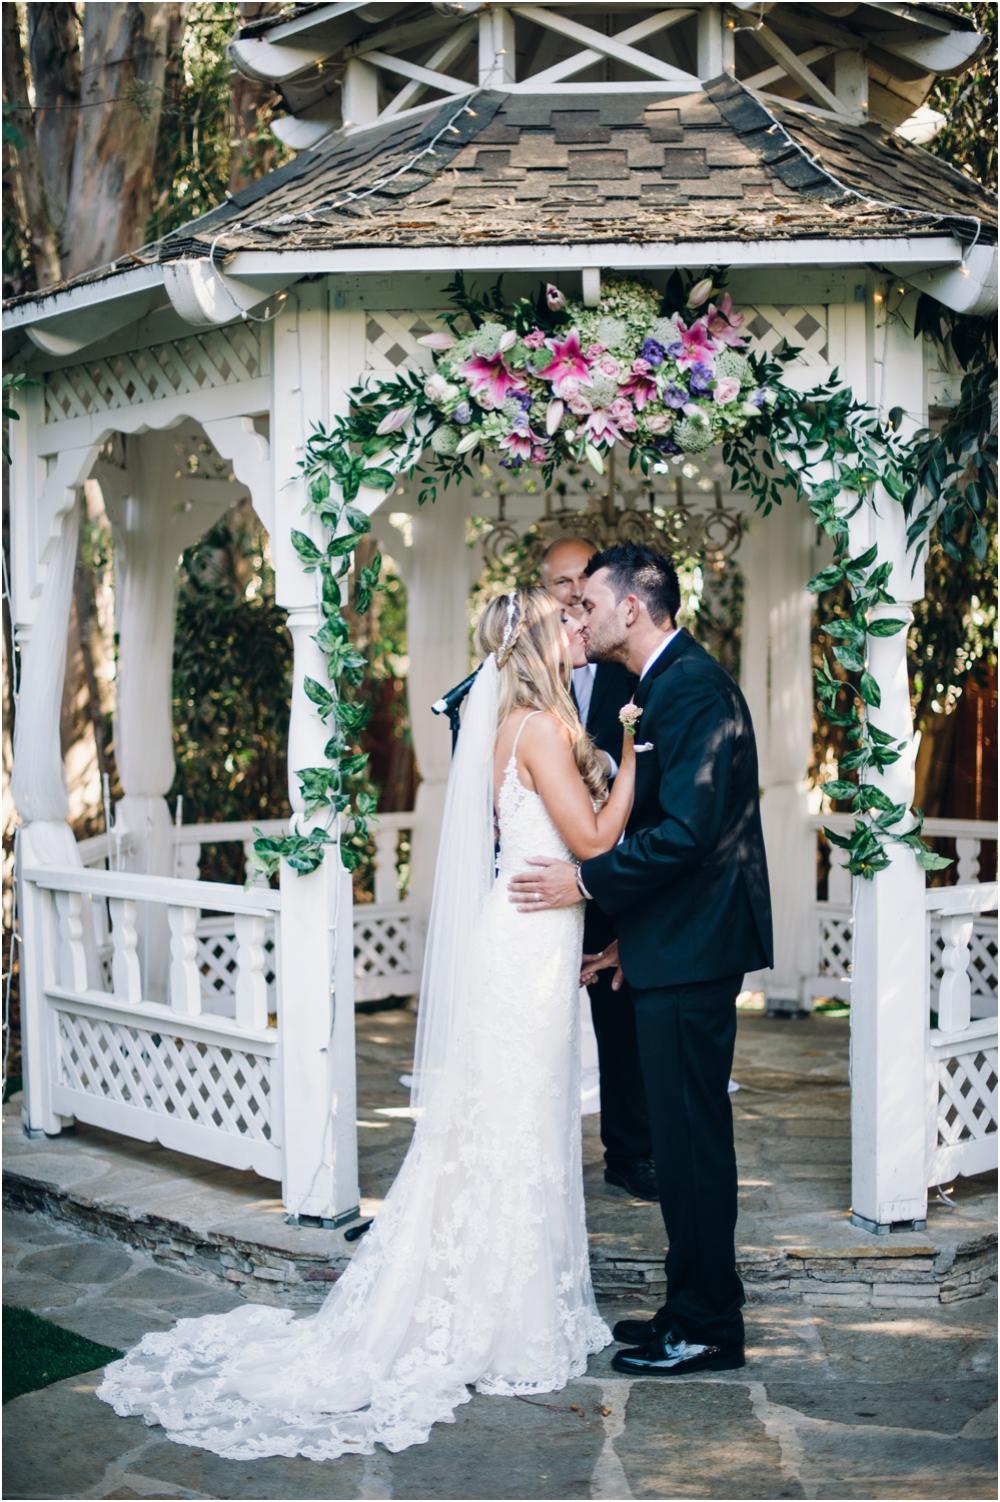 twin_oaks_weddings_photography_012.jpg